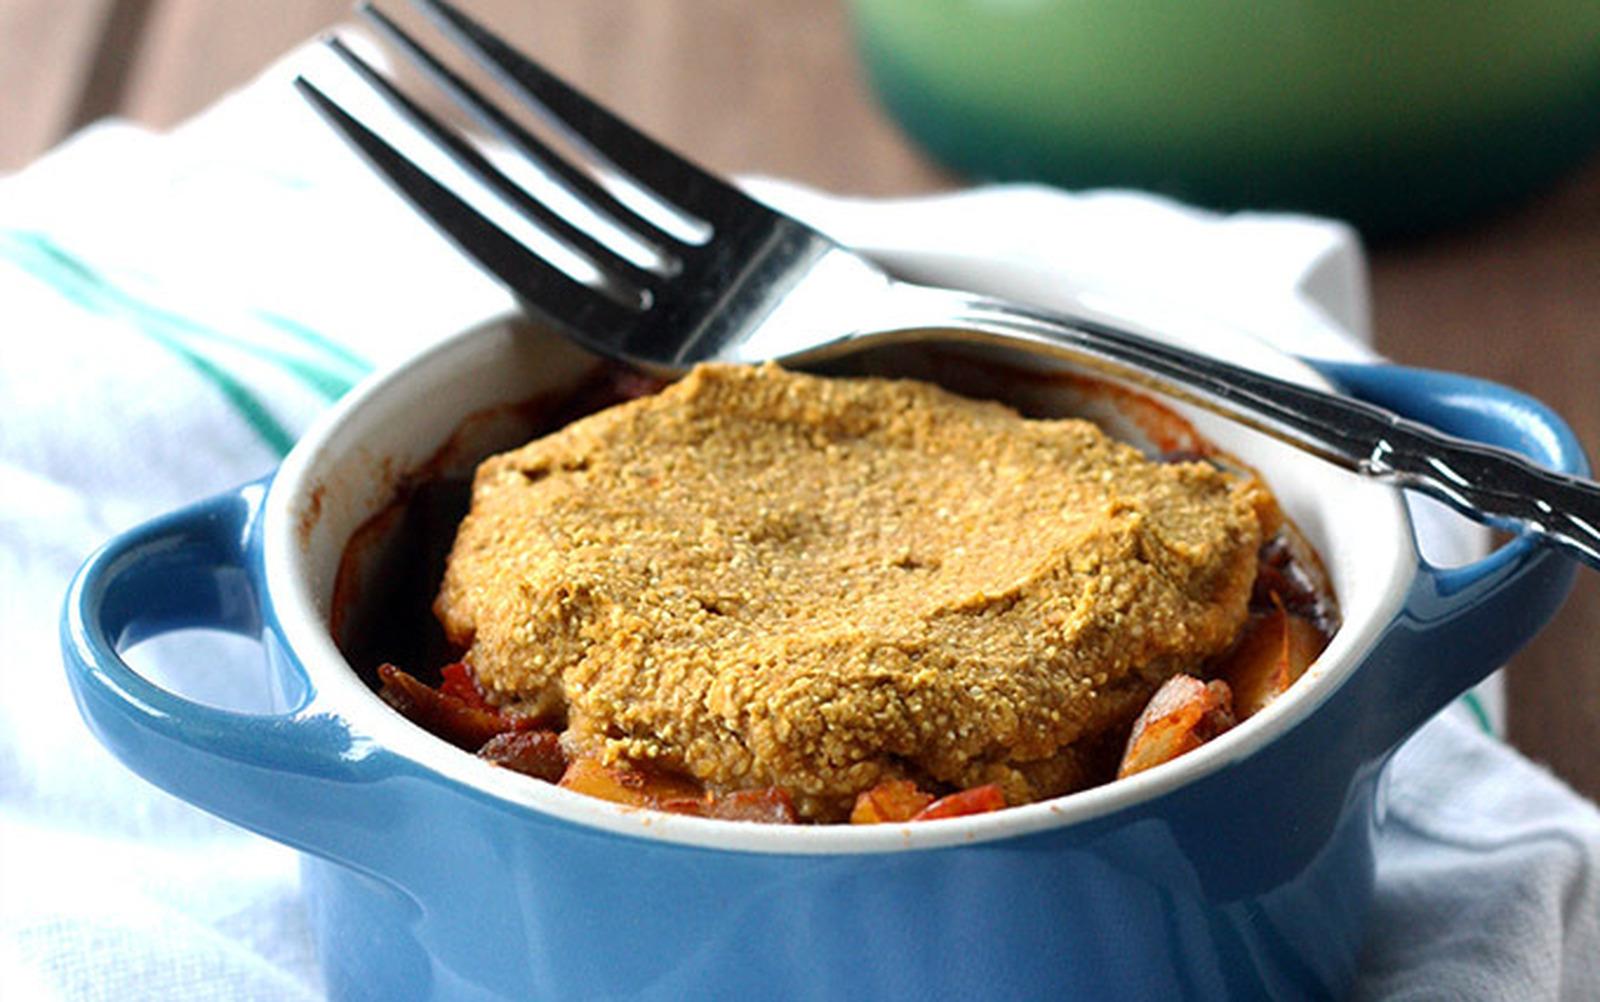 Lentil Chili Pot Pie with Pumpkin Cornbread Topping [Vegan, Gluten-Free]